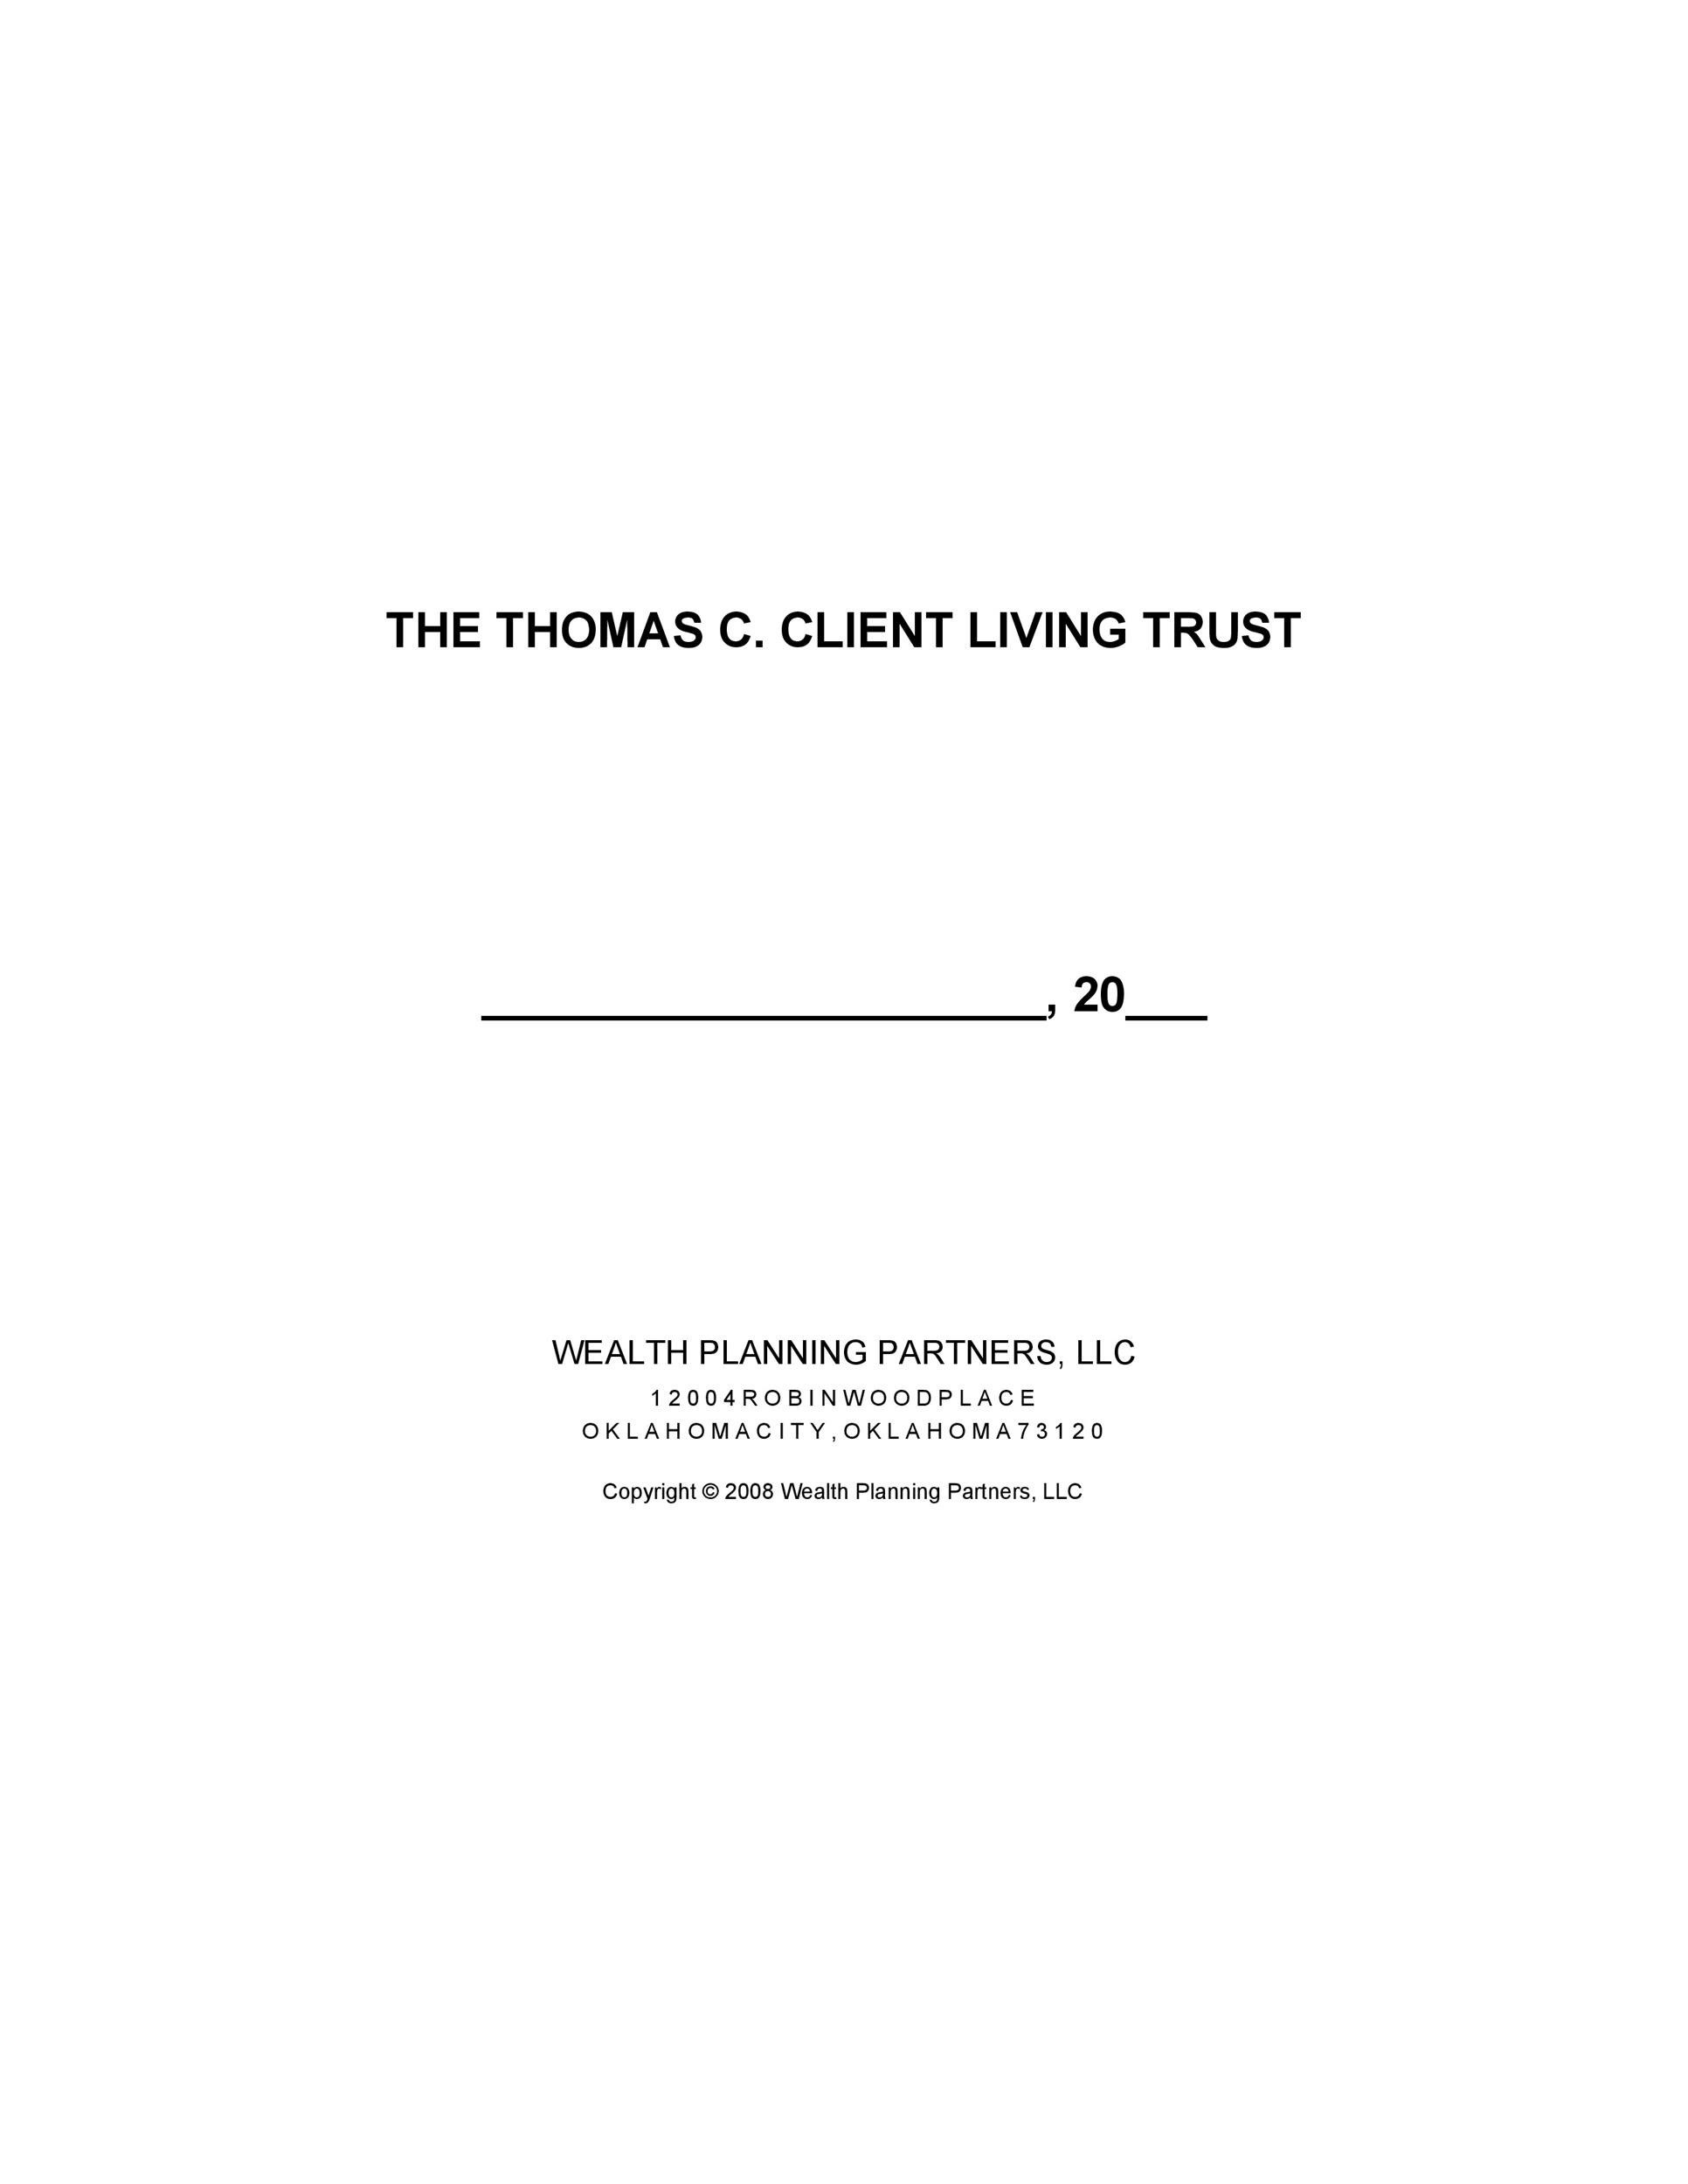 Free trust agreement 17